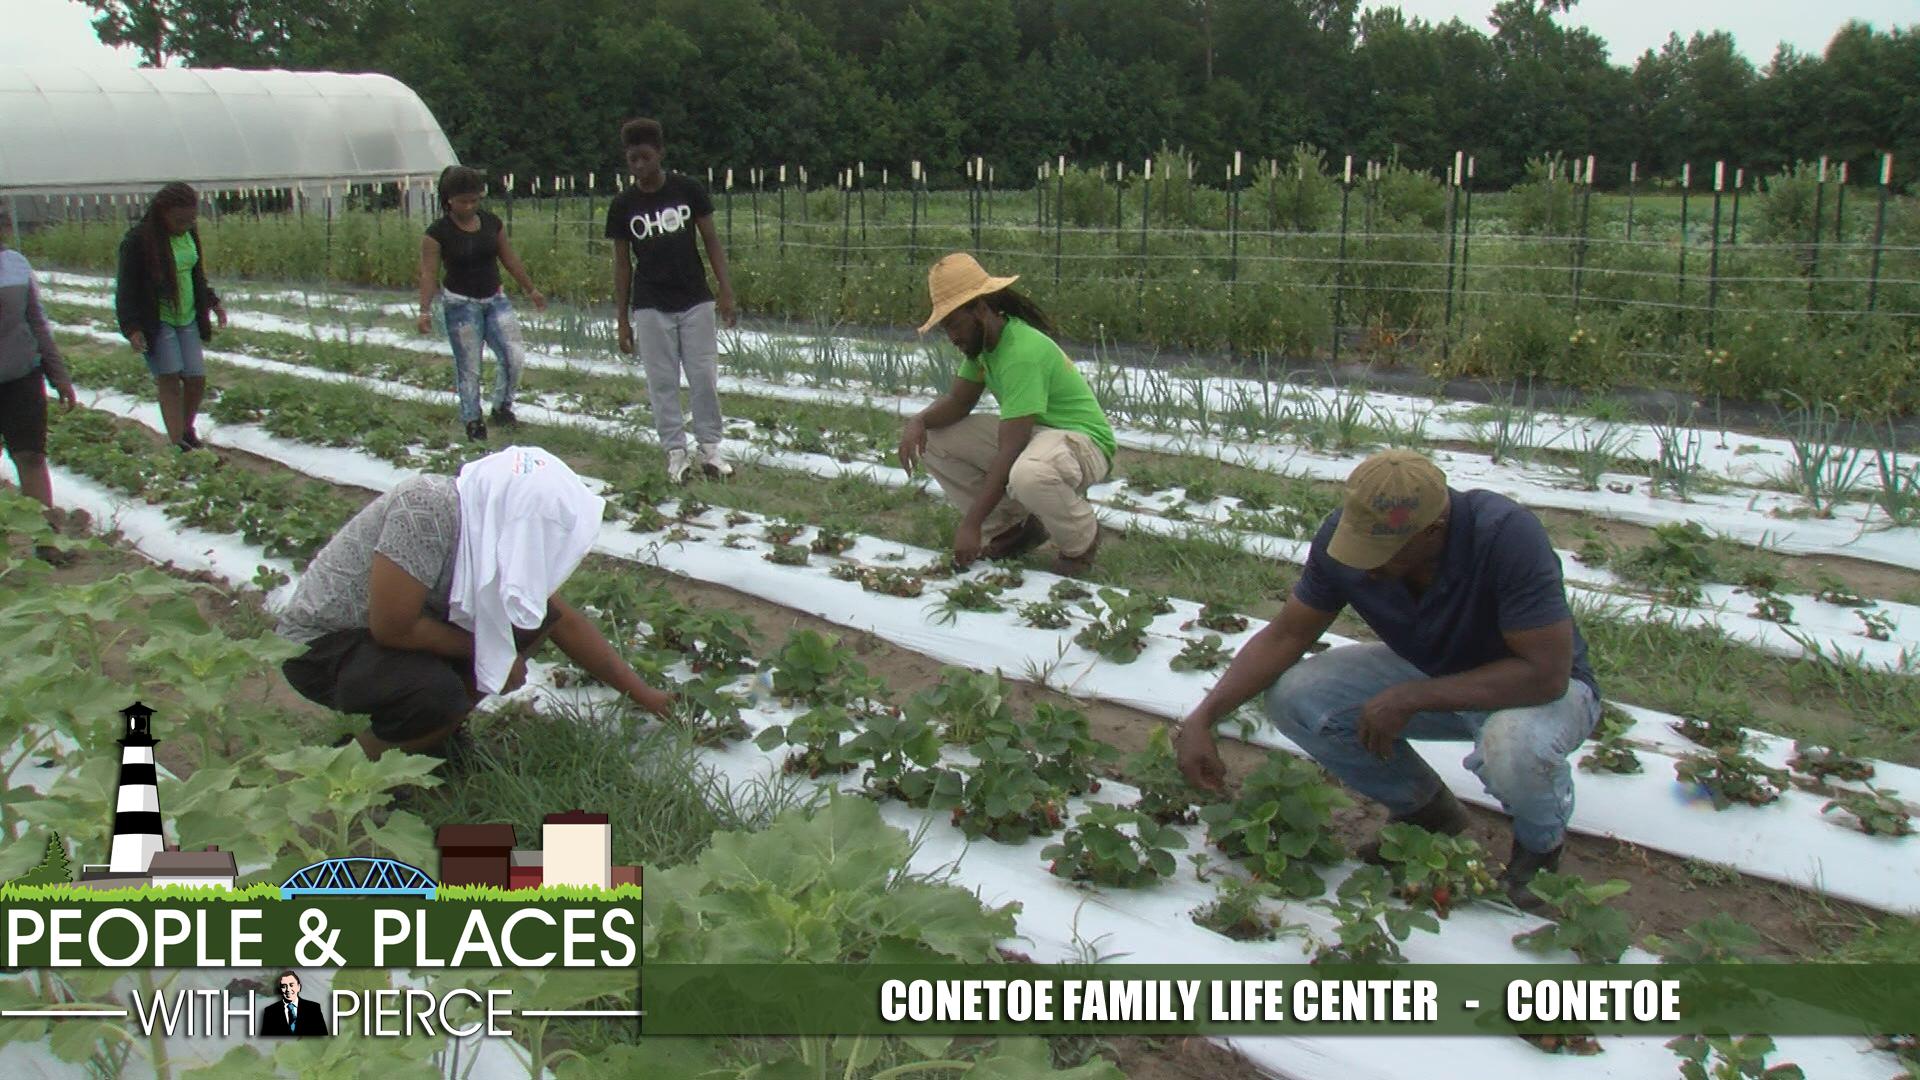 conetoe family life center ppp for web_436478